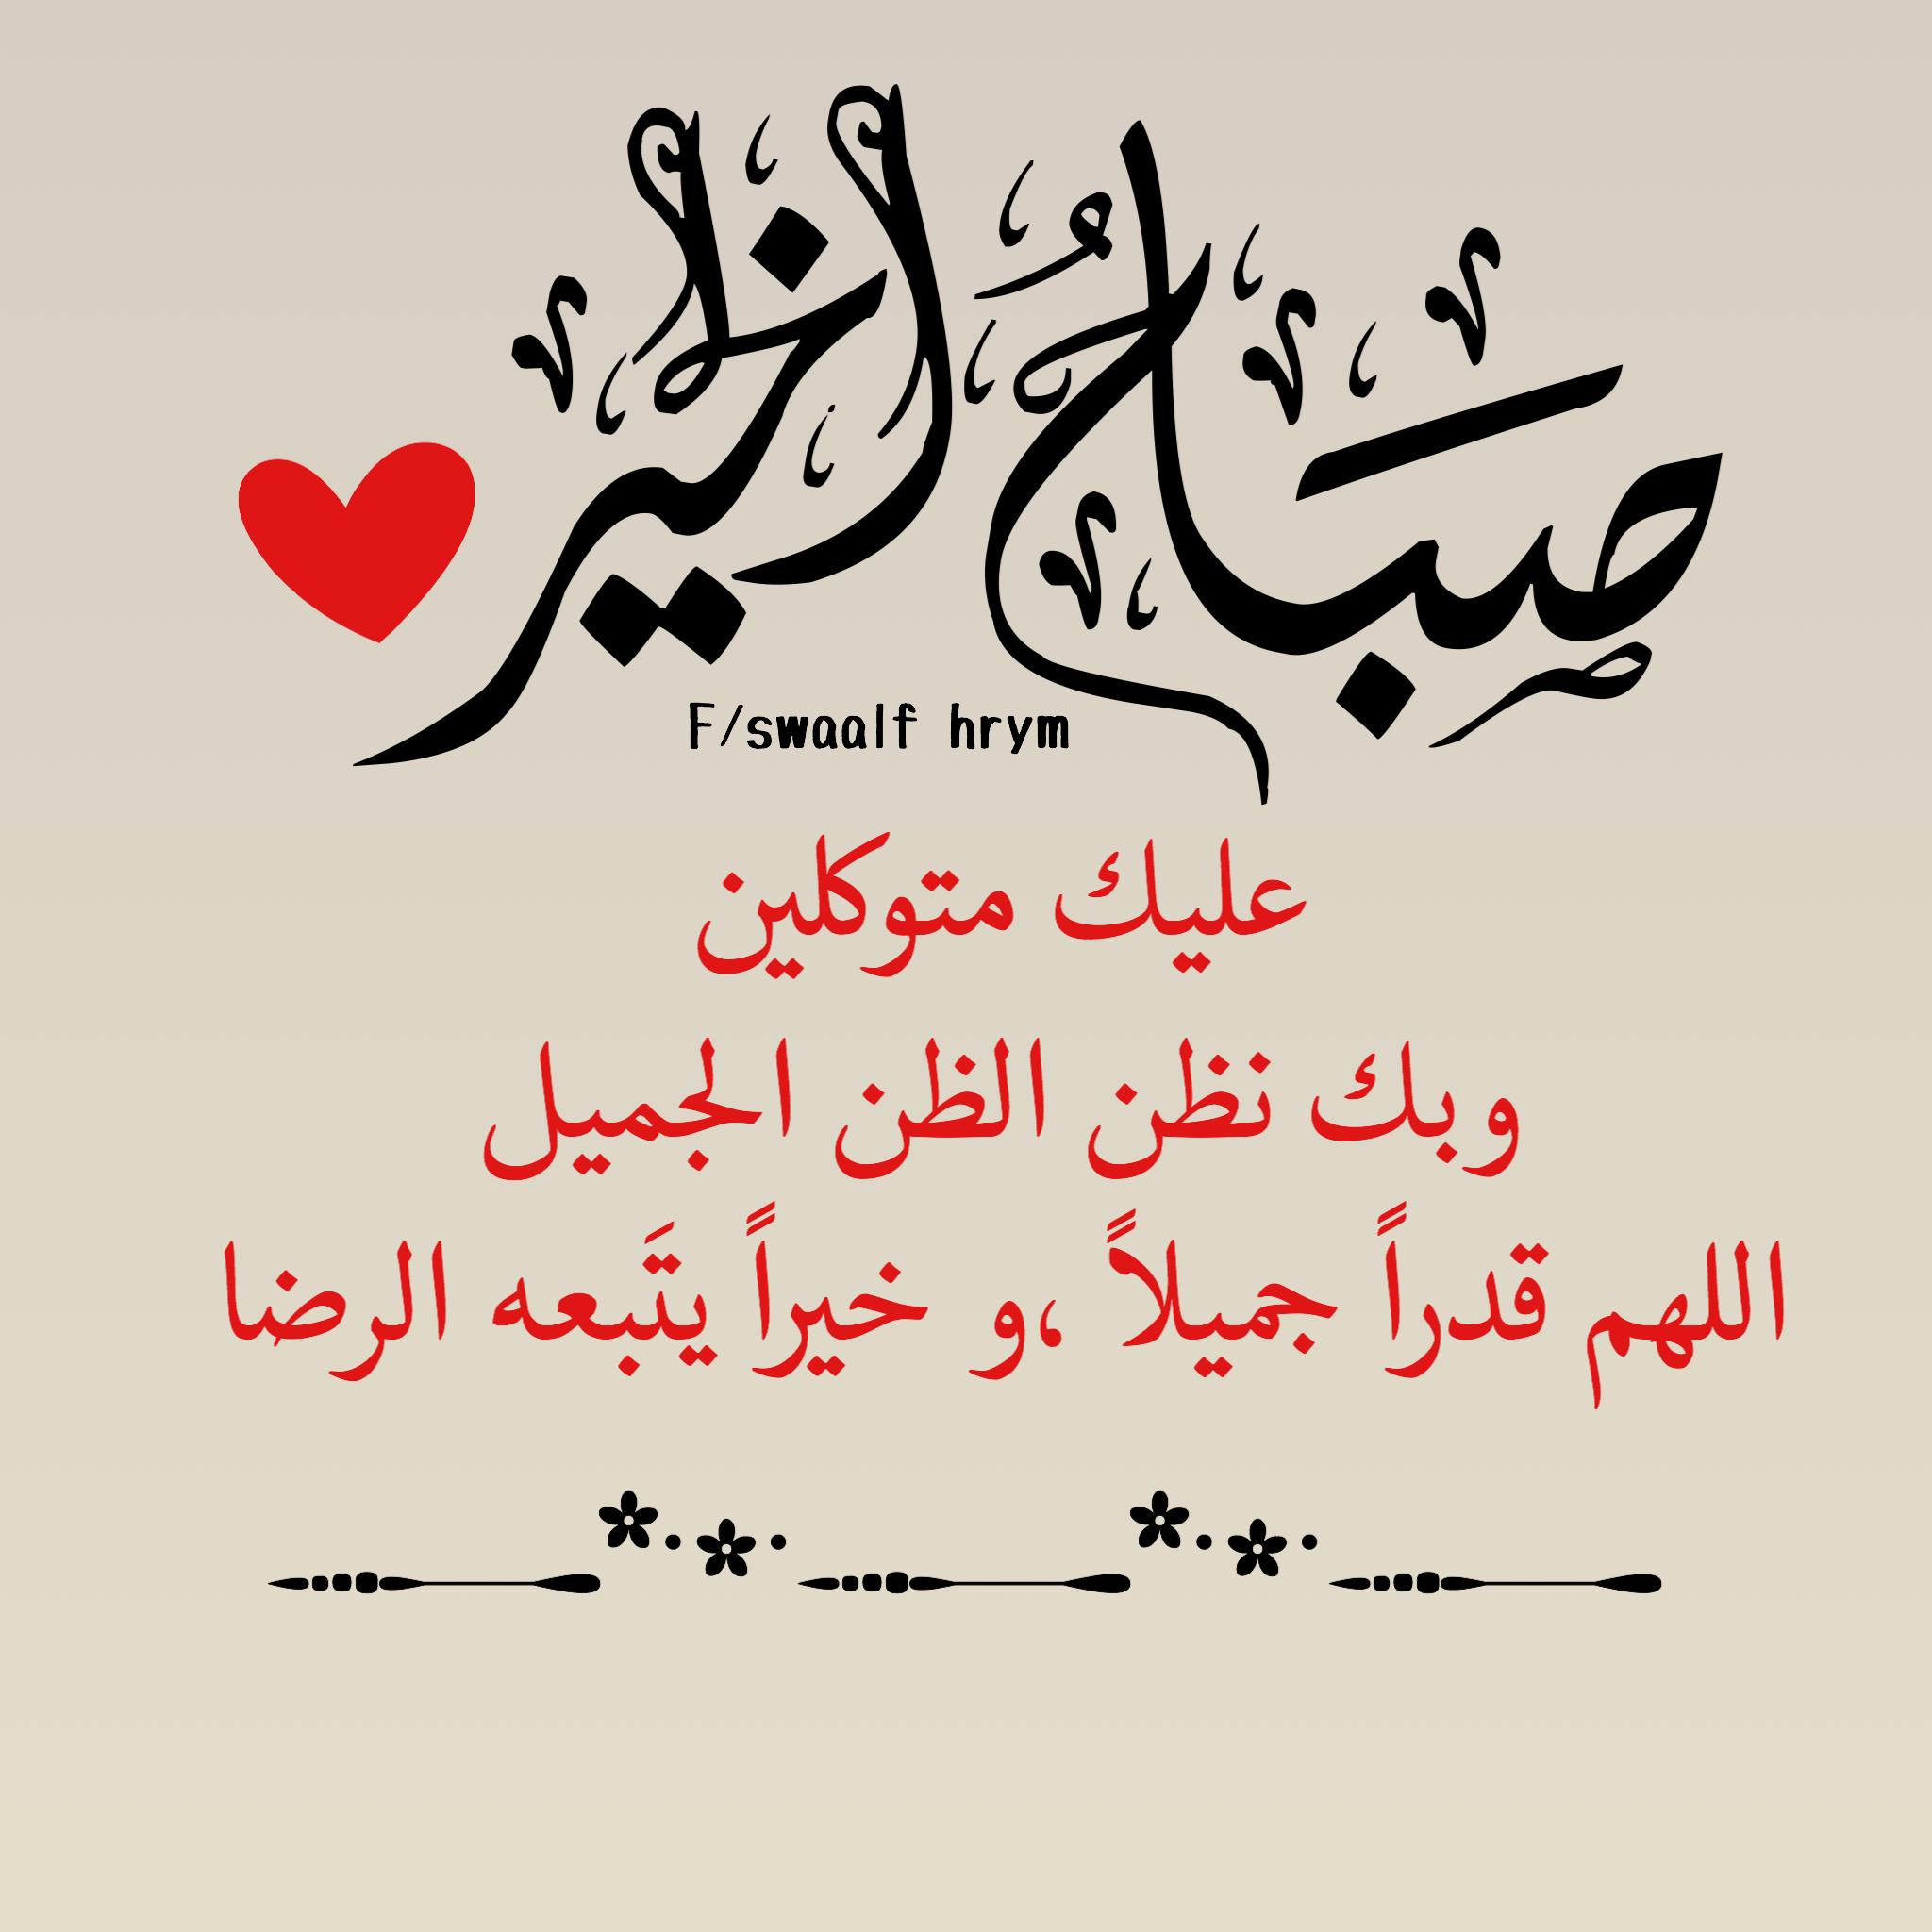 صباح الخير Good Morning Greetings Compliments